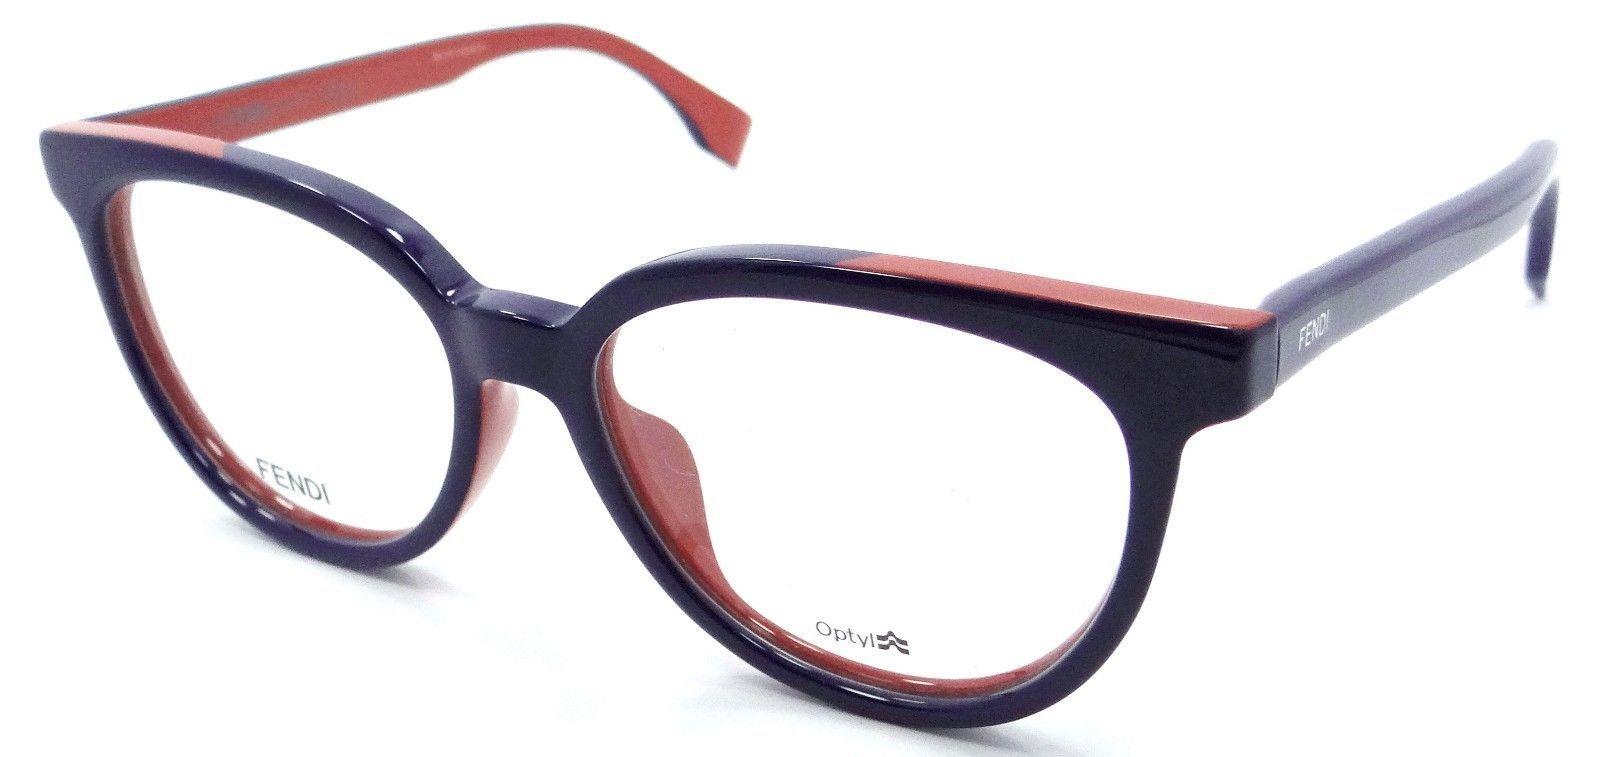 d100319845d Fendi Rx Eyeglasses Frames FF 0122 F MFW 51-16-140 Blue Brick Italy Asian  Fit -  120.54